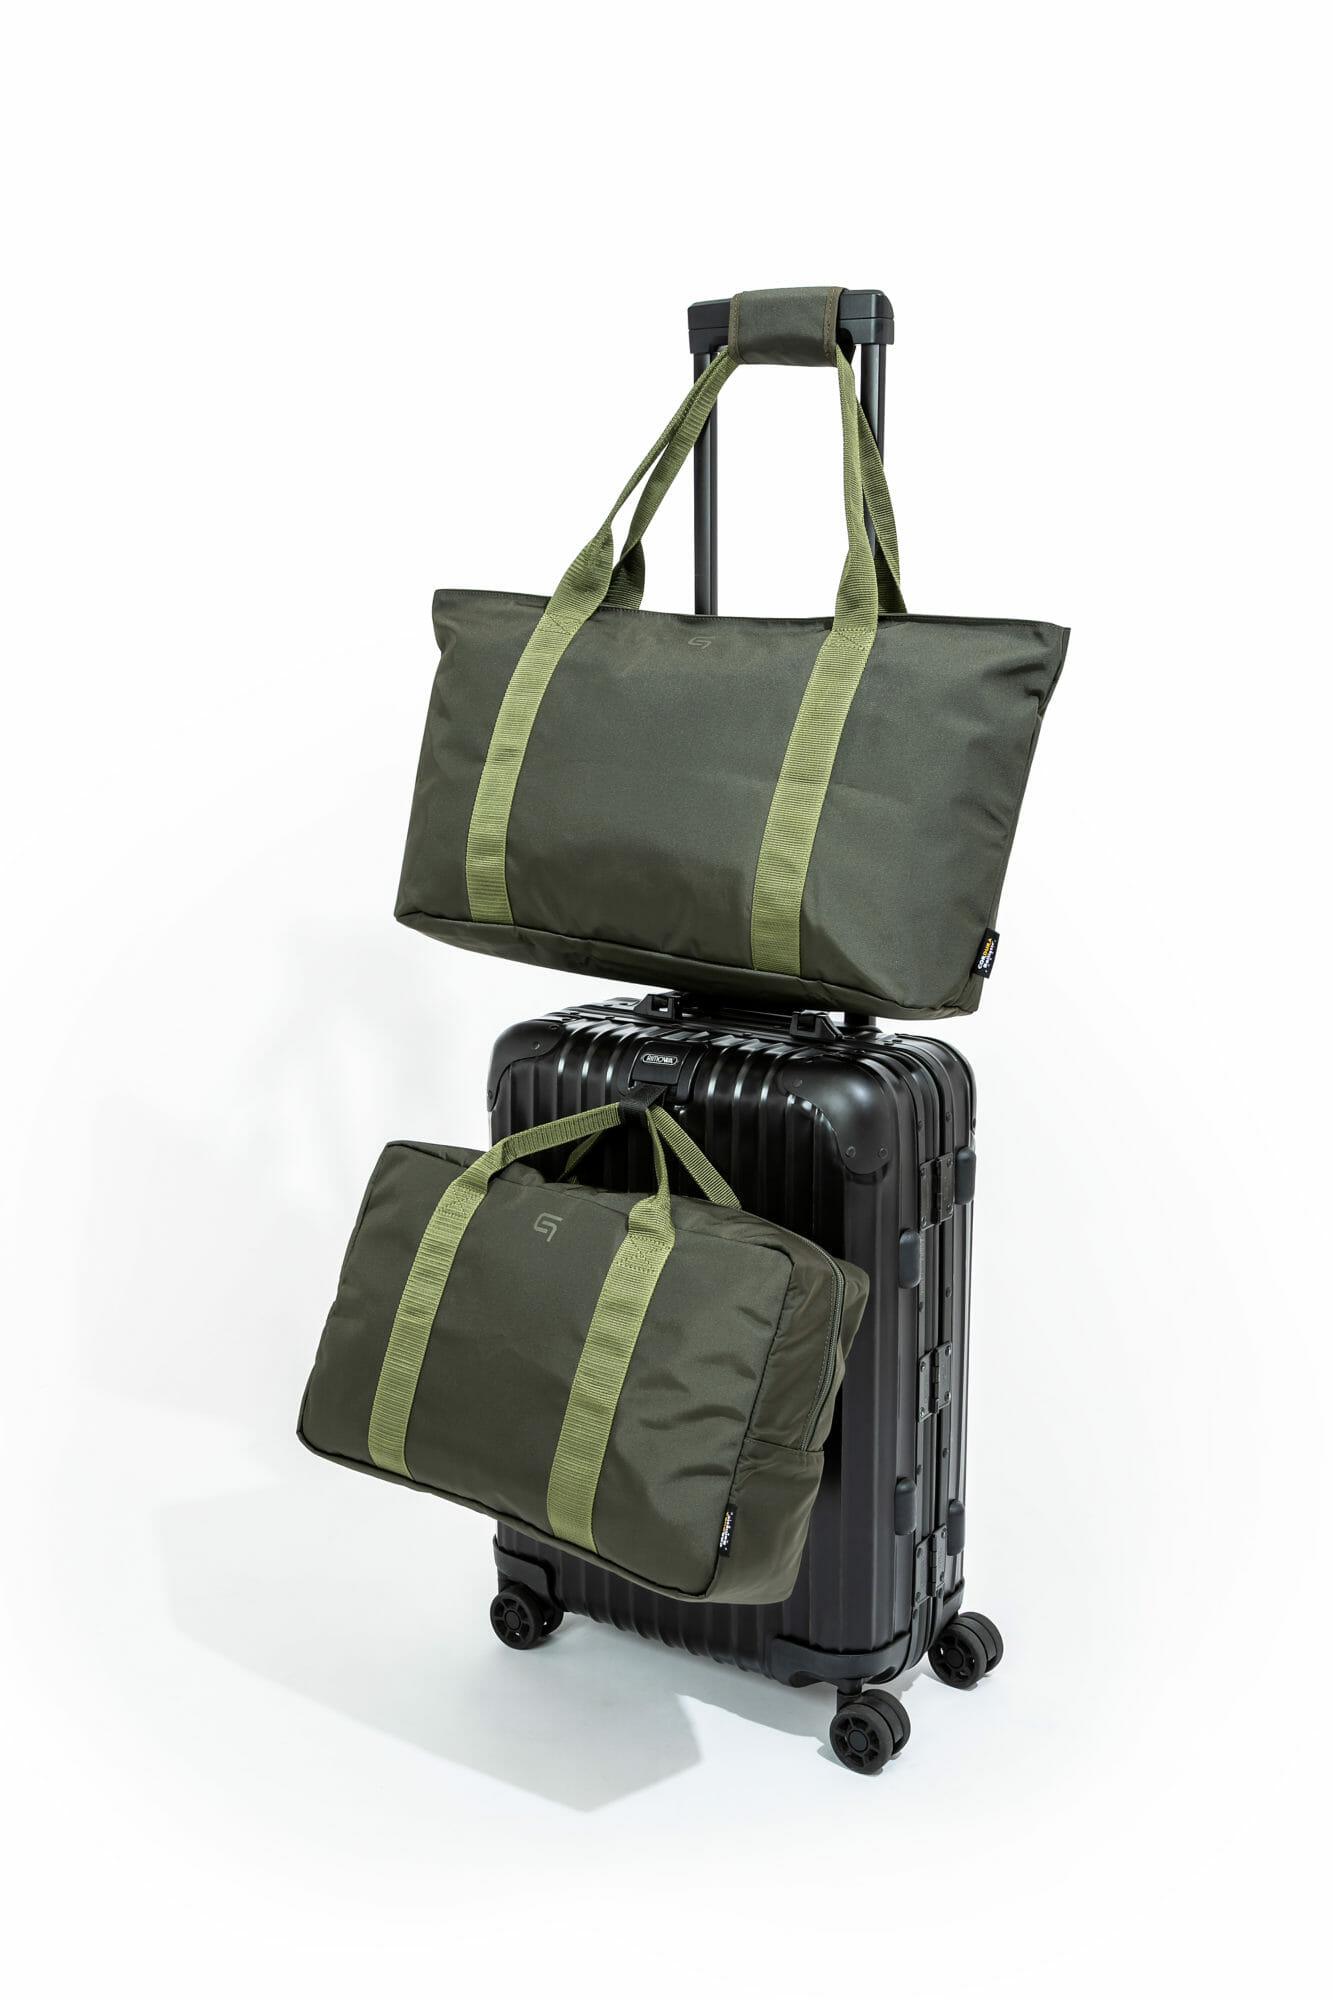 GRAMAS, 飛行機, 出張, 旅行, 機内持ち込み, 手荷物, バッグ, トラベルバッグ